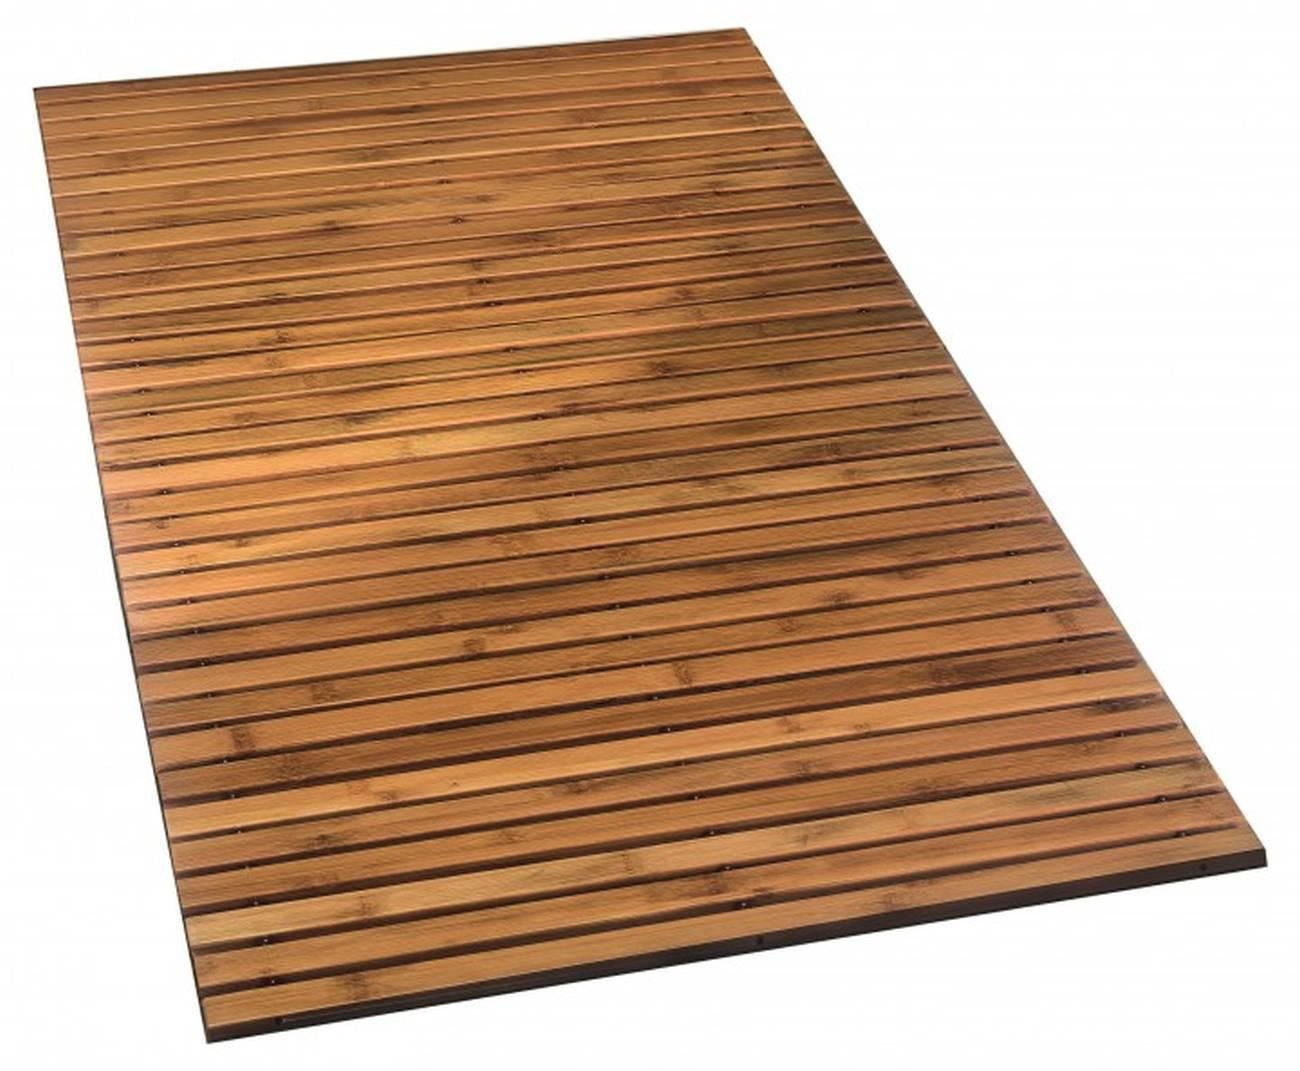 Holzmatte Level Bambus Natur 50x 80 cm